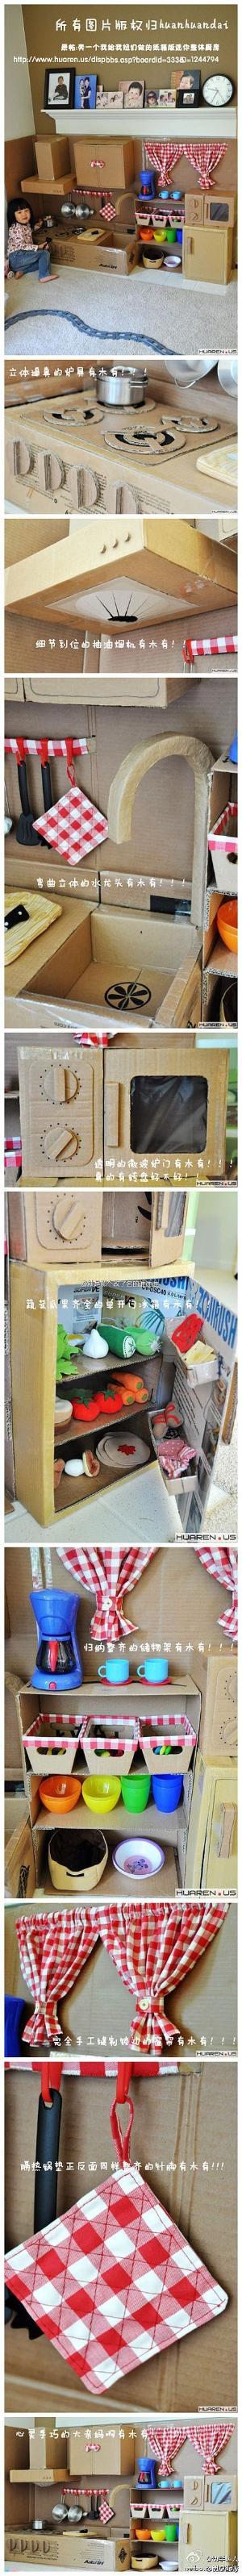 DIY cardboard kitchen by jenniferET